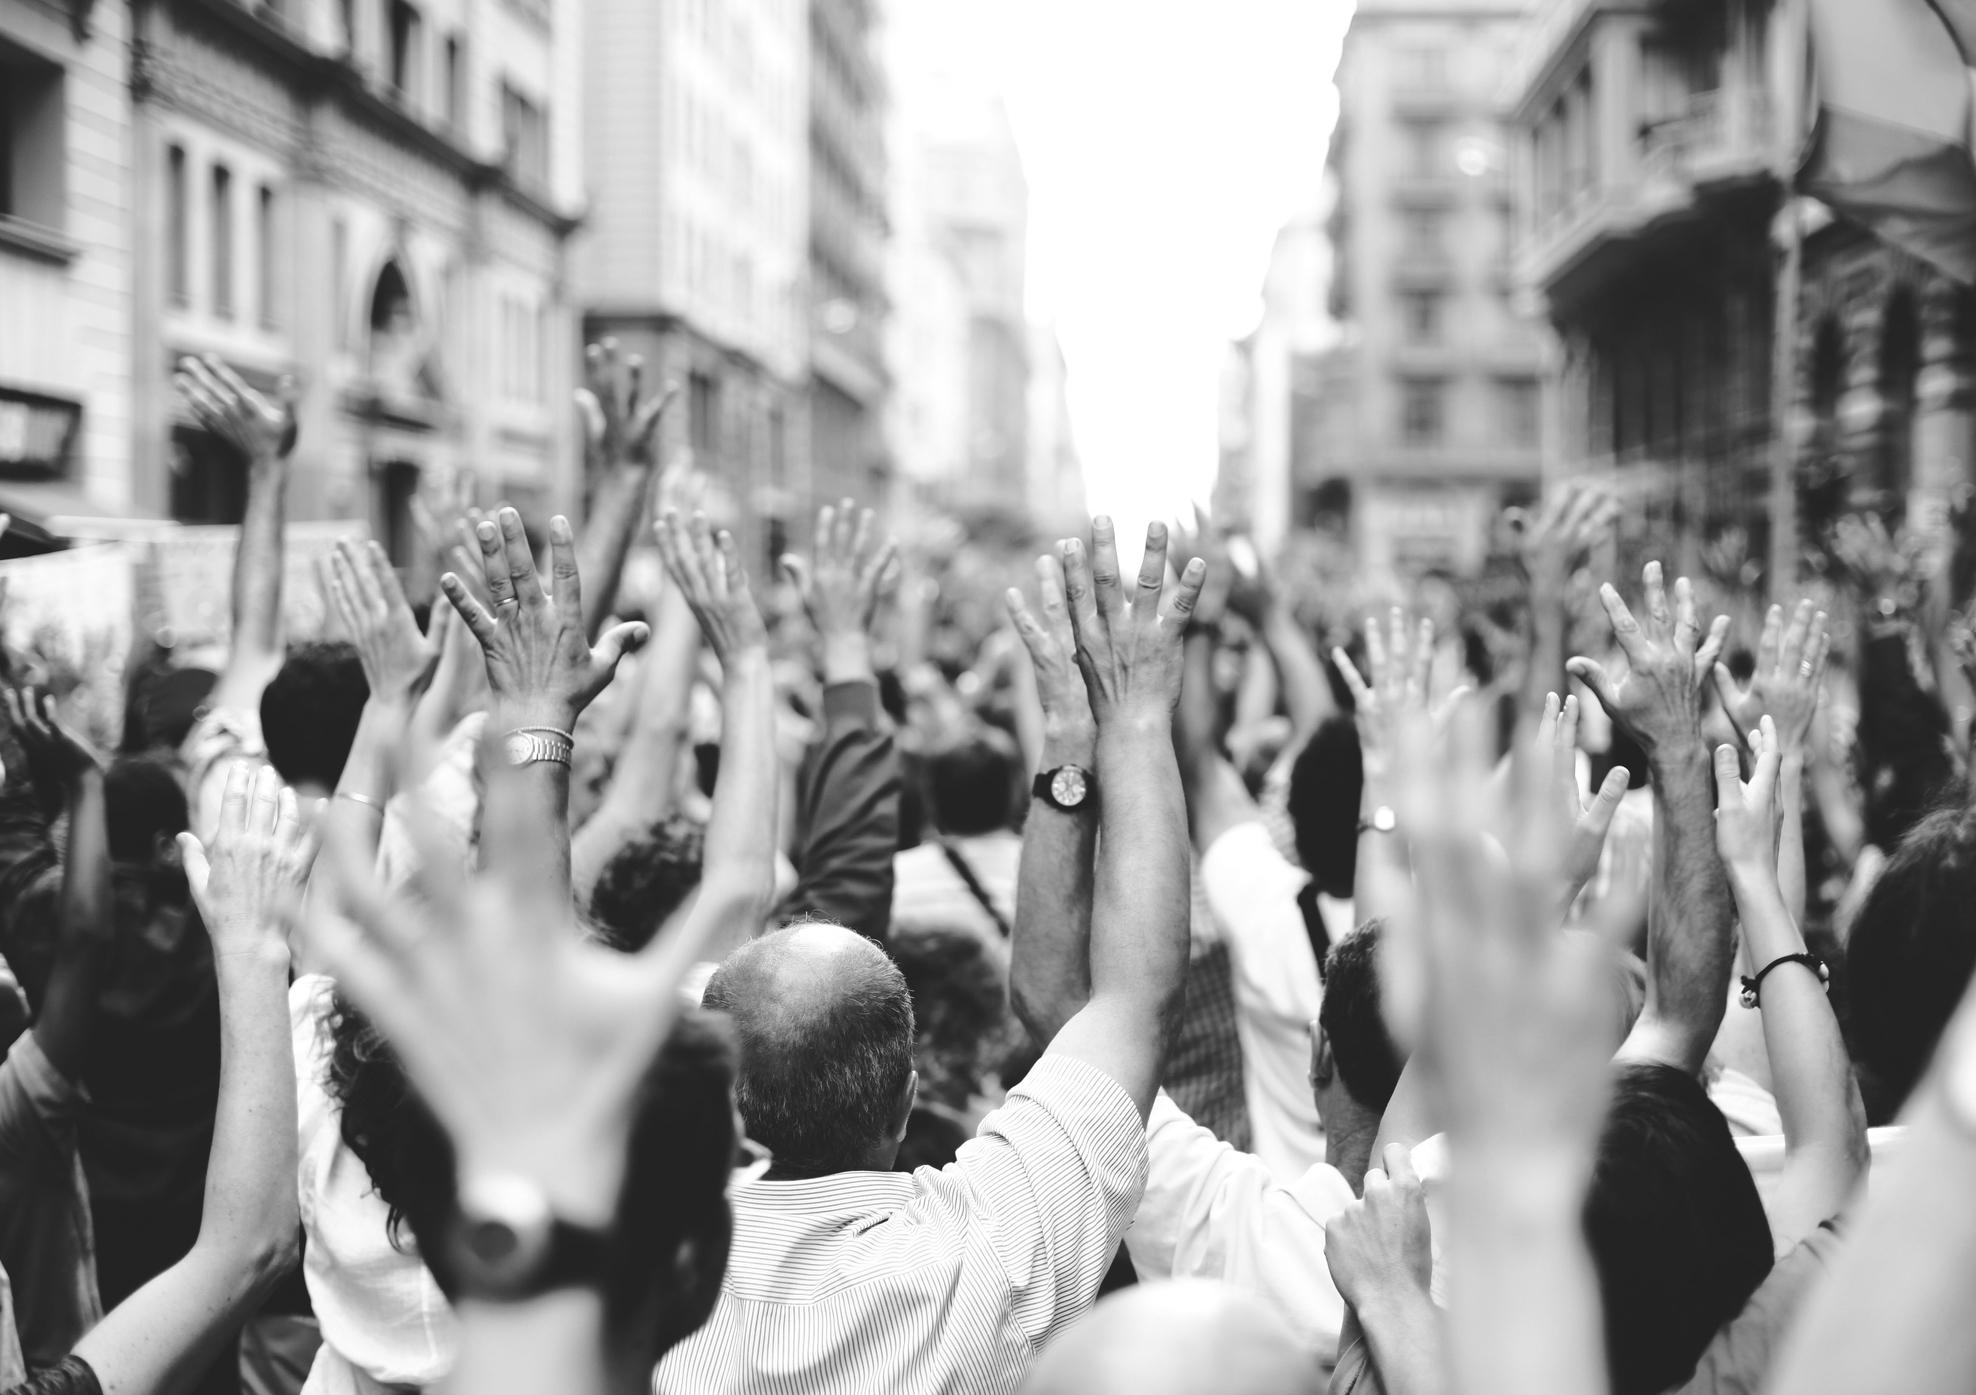 persone in piazza